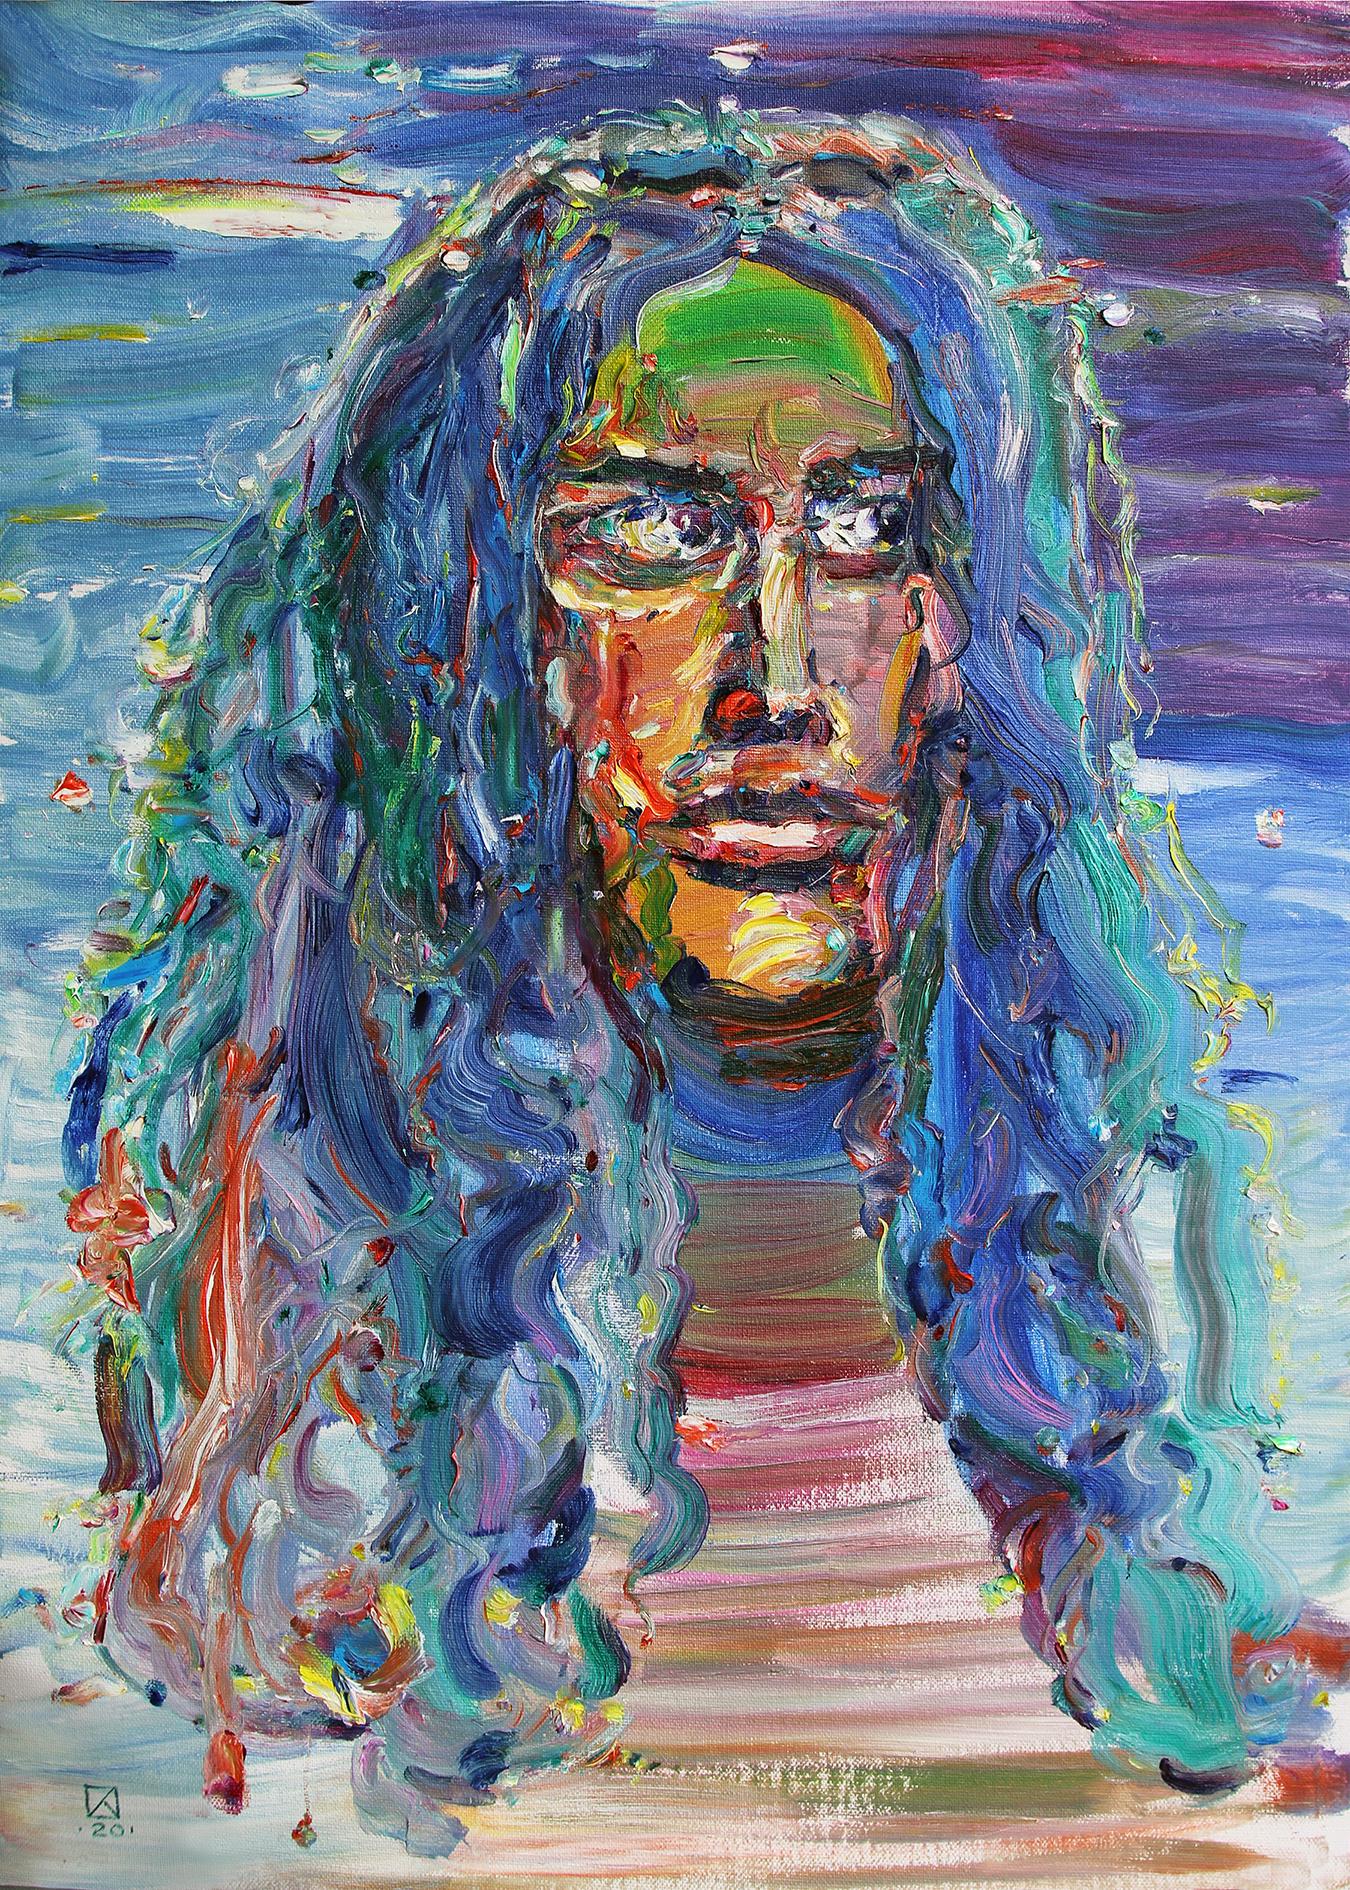 Igor Hippie. Hello from the 70s. 2020. Oil on canvas, cardboard. 70 x 50